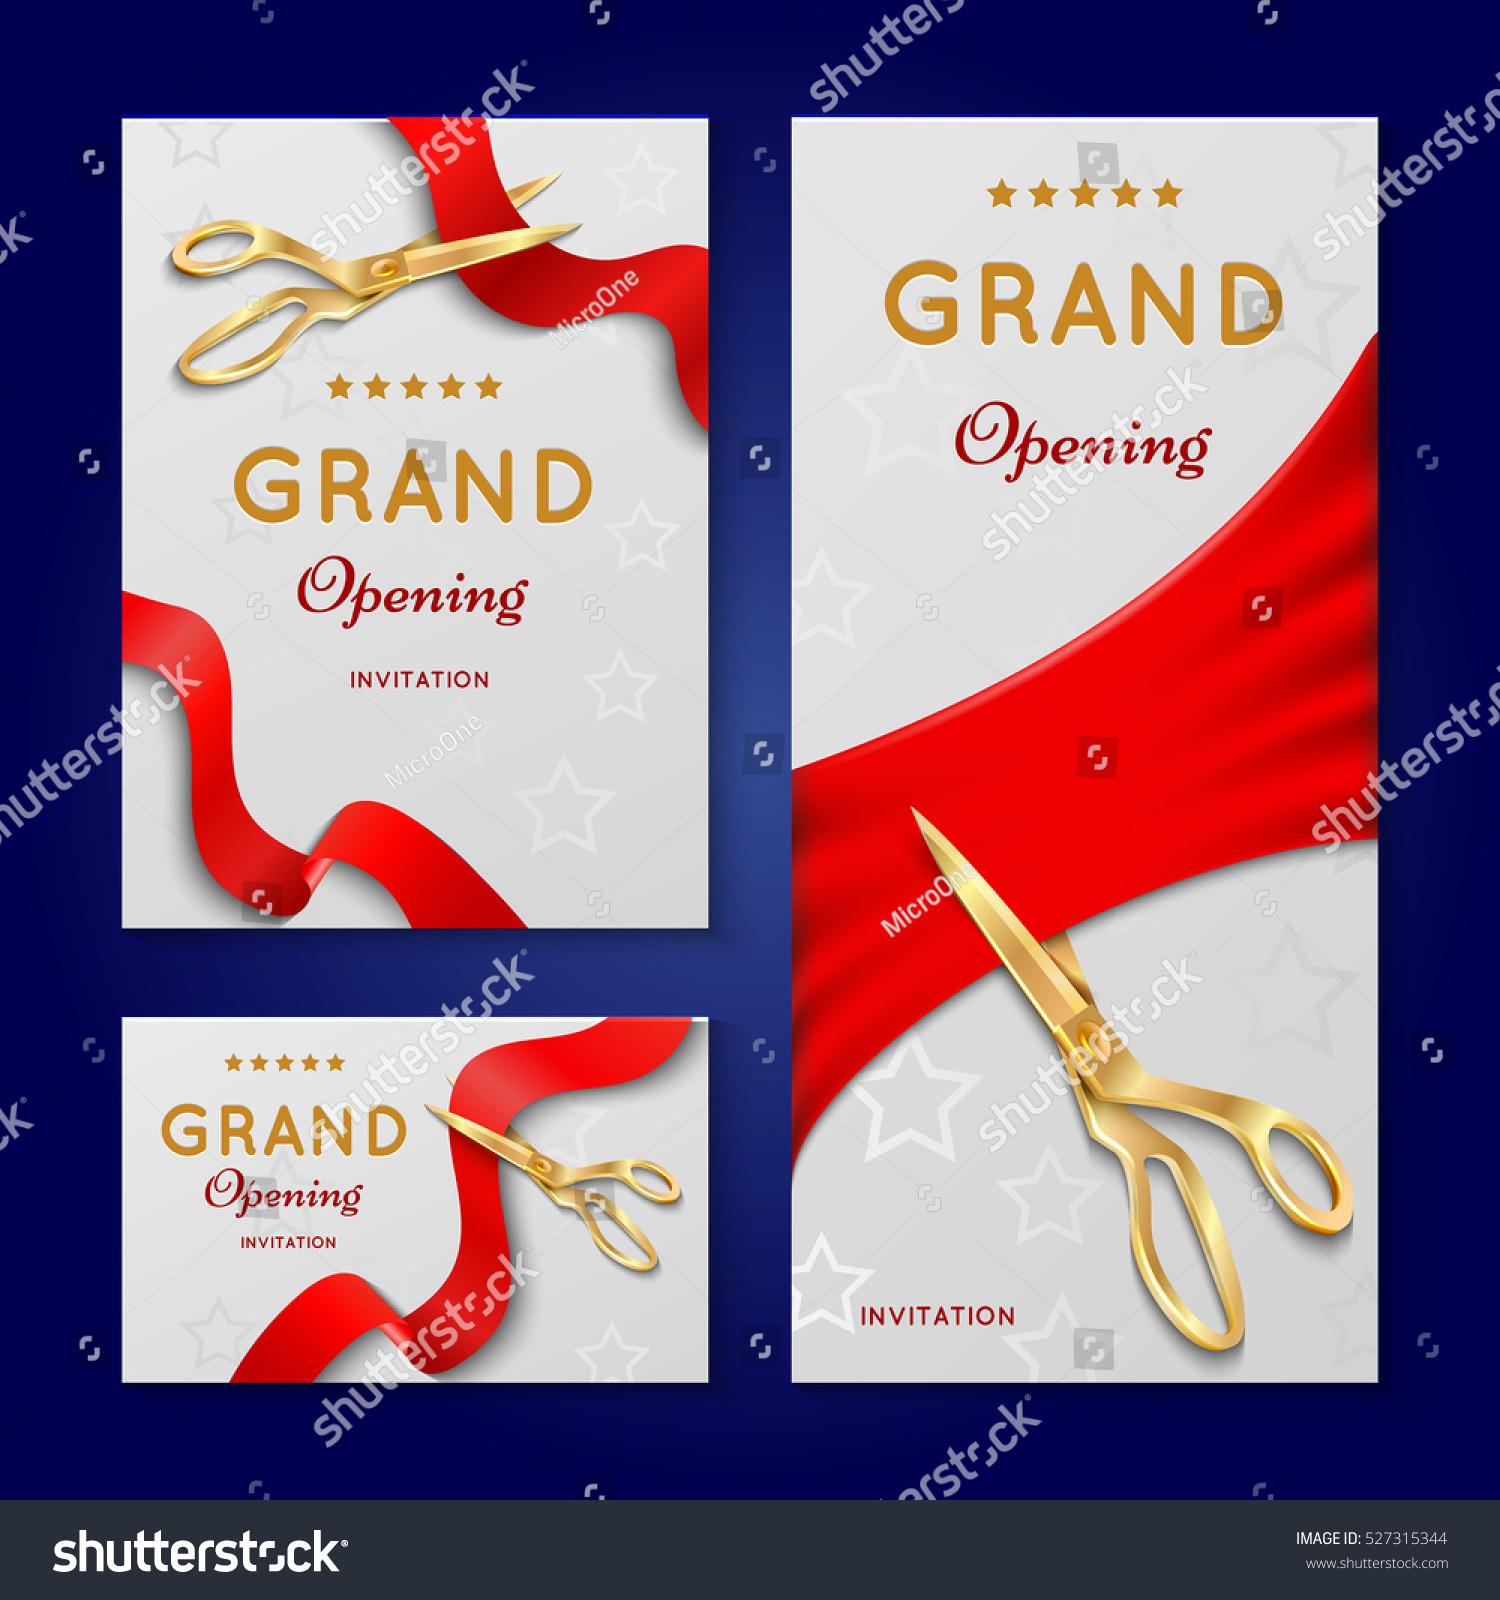 ribbon cutting scissors grand opening ceremony stock vector 527315344 shutterstock. Black Bedroom Furniture Sets. Home Design Ideas